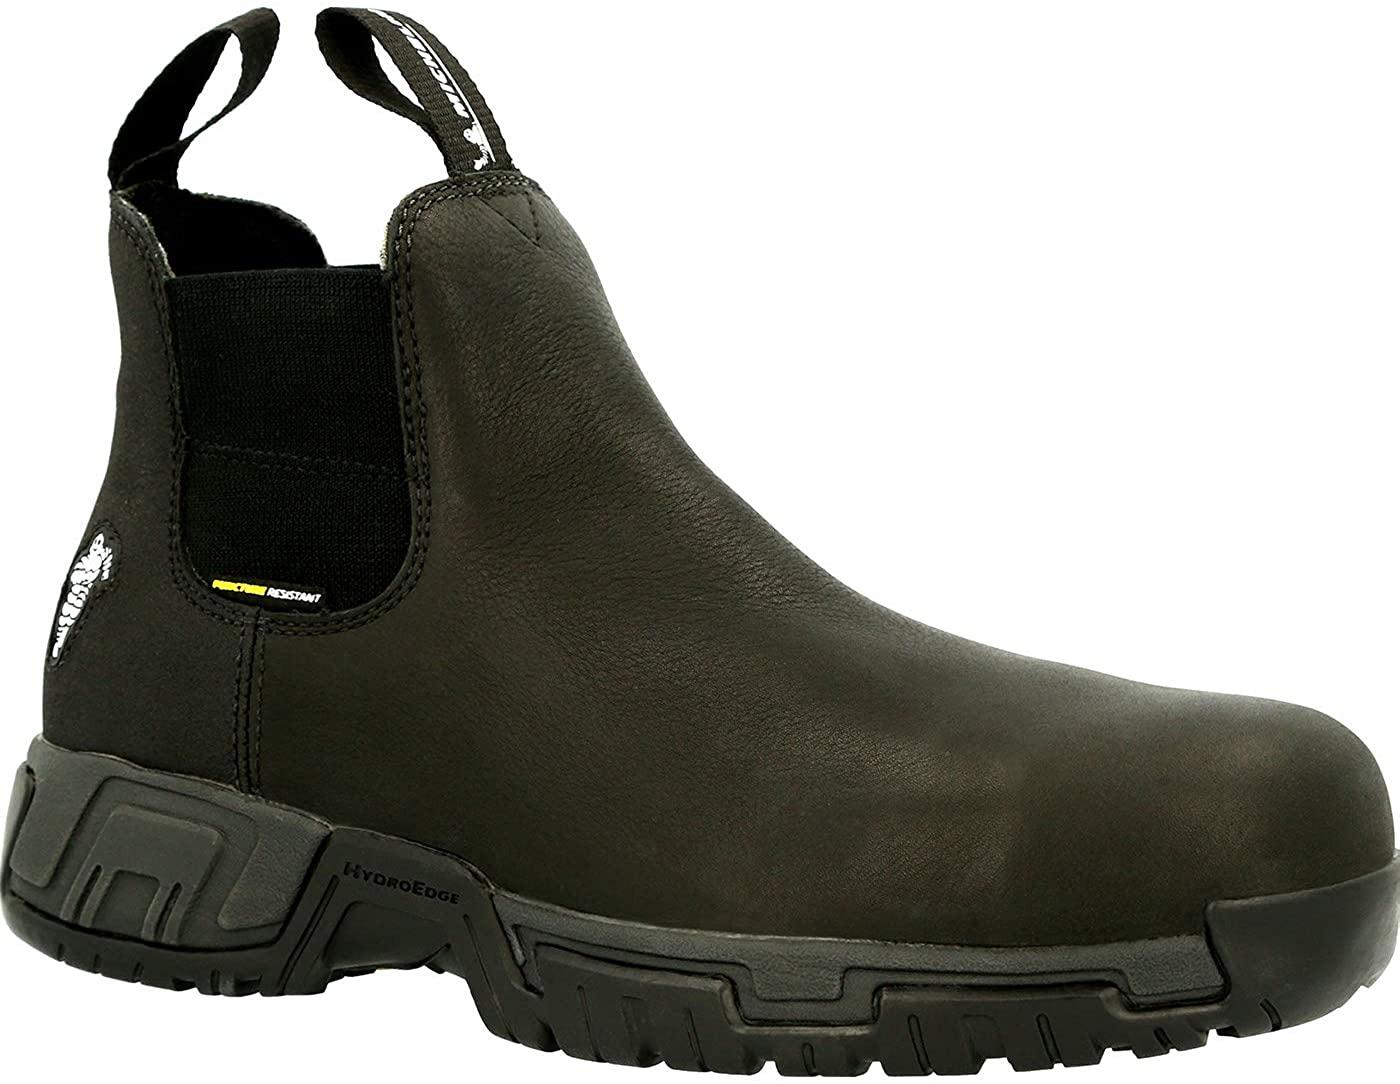 MICHELIN HydroEdge Puncture Resistant Alloy Toe Waterproof Chelsea Work Boot Size 10(W) Black